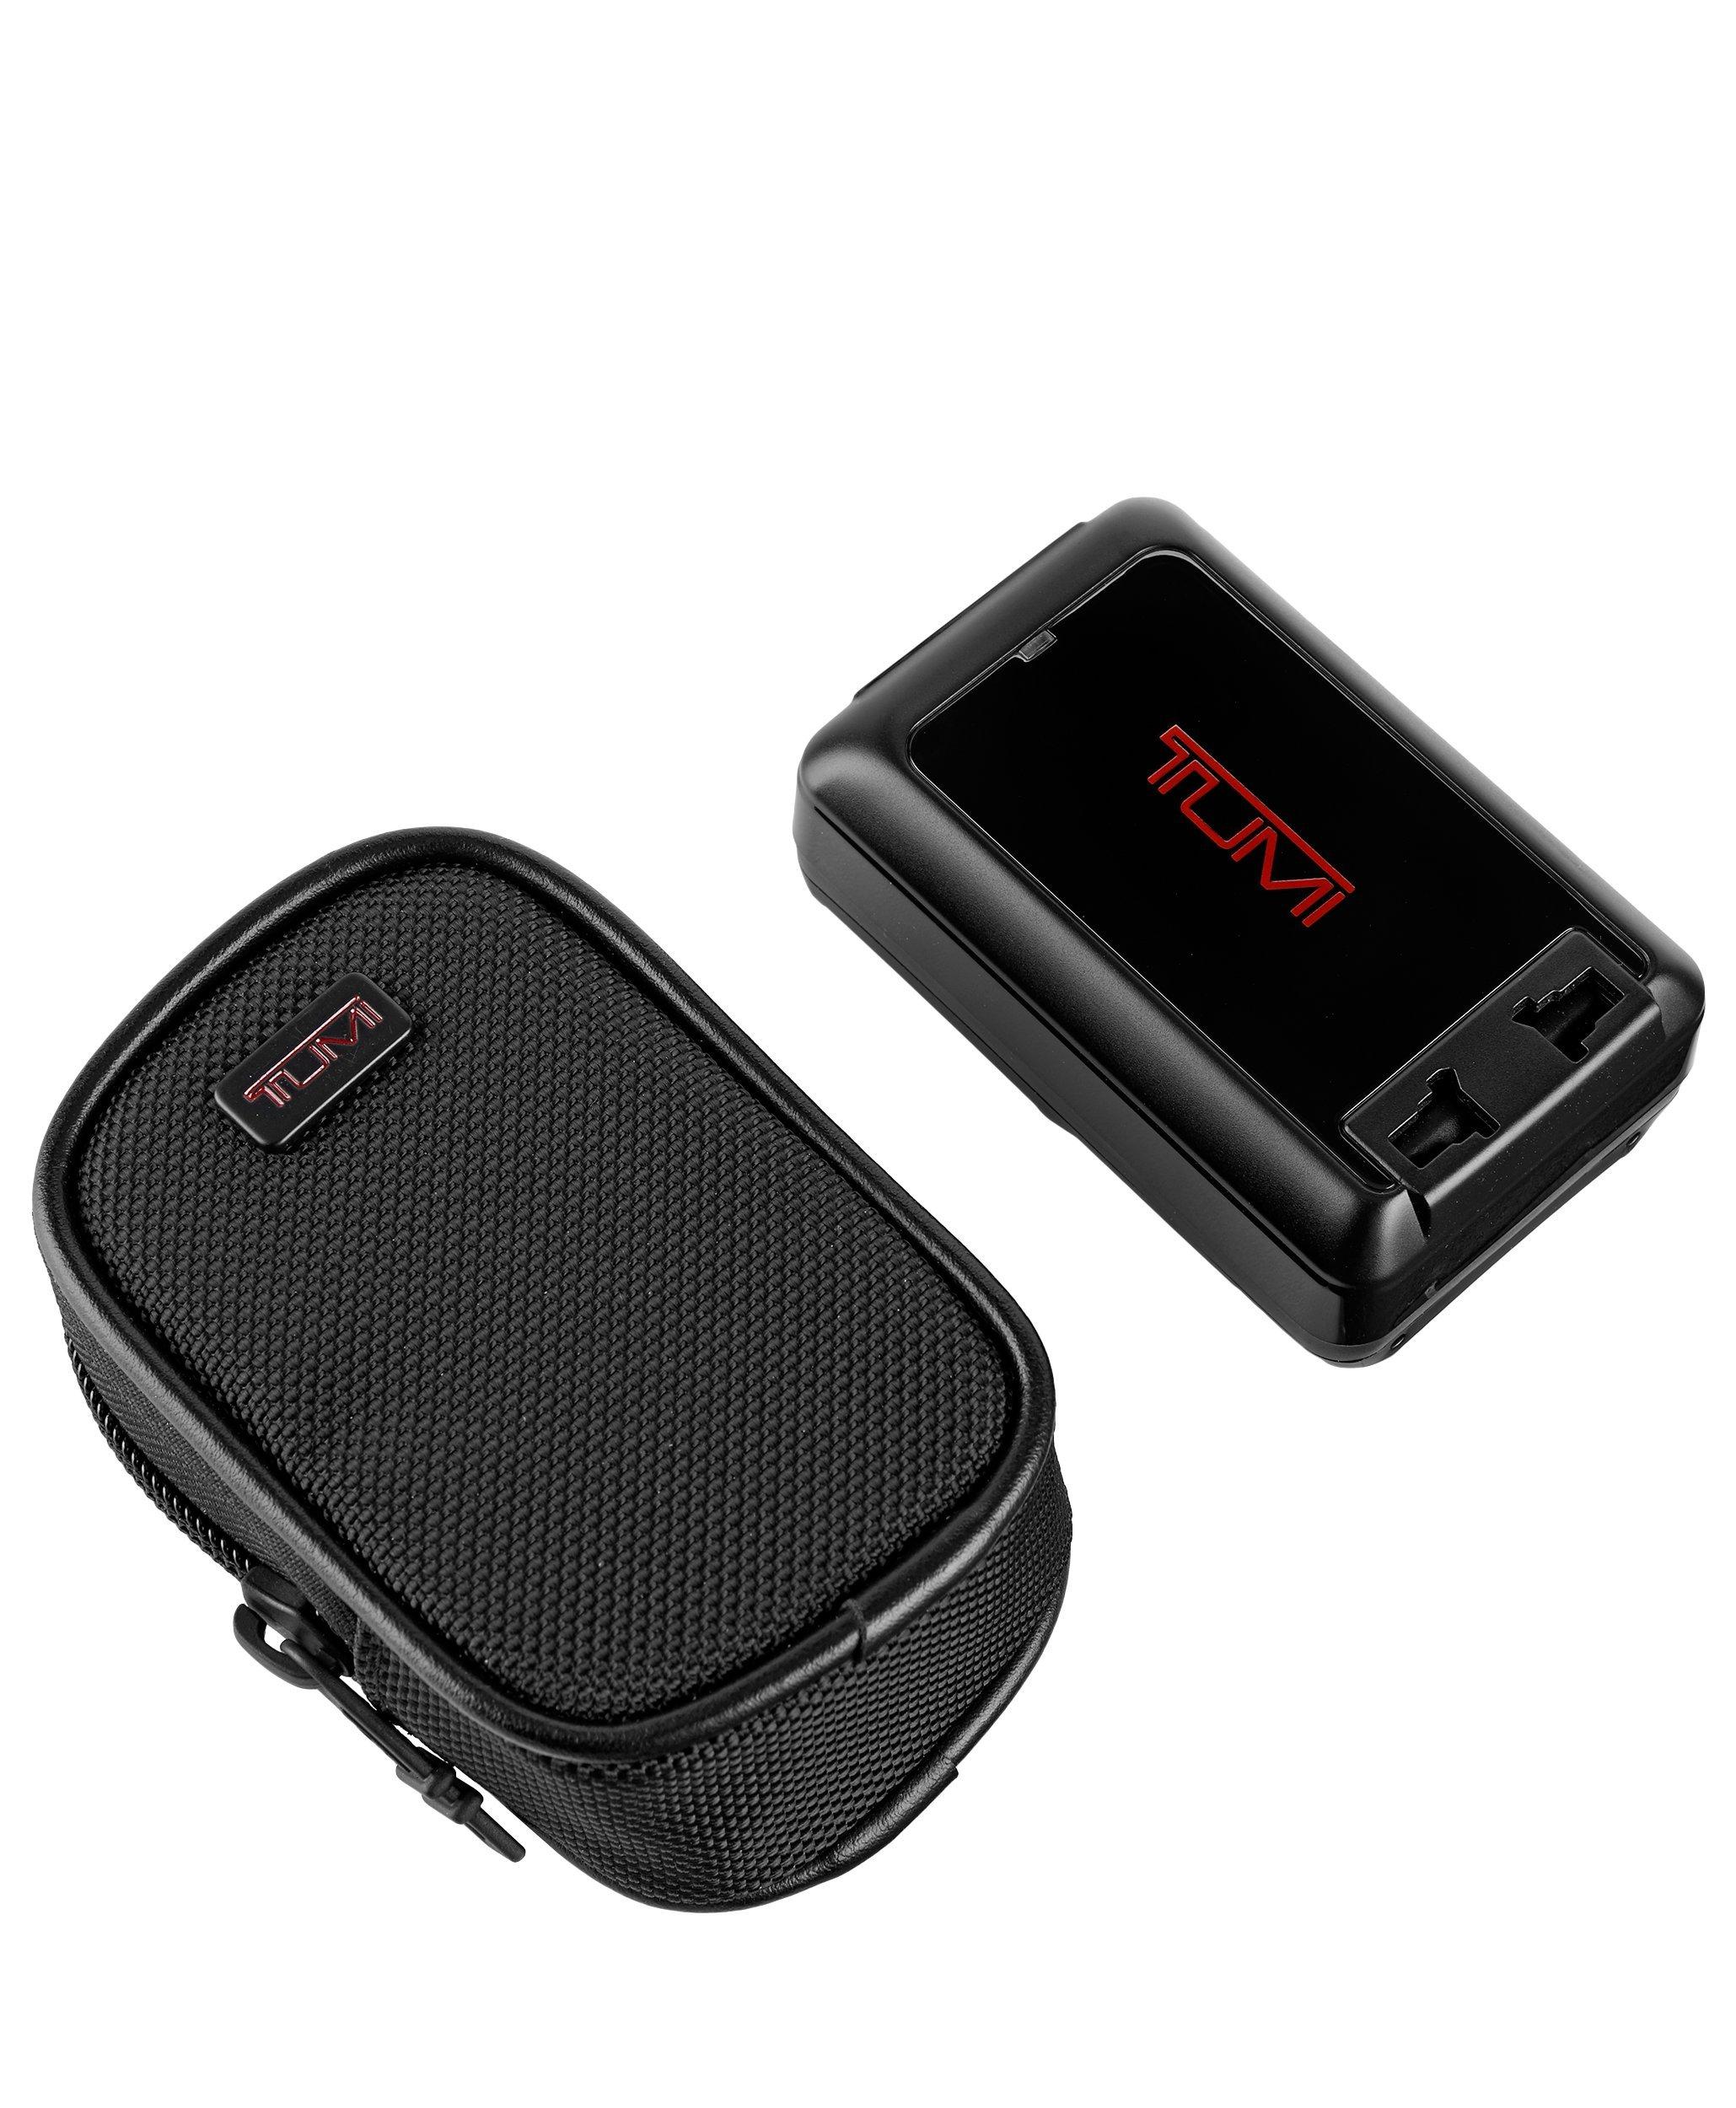 Tumi 4 Port USB Travel Adaptor, Black, One Size by Tumi (Image #4)